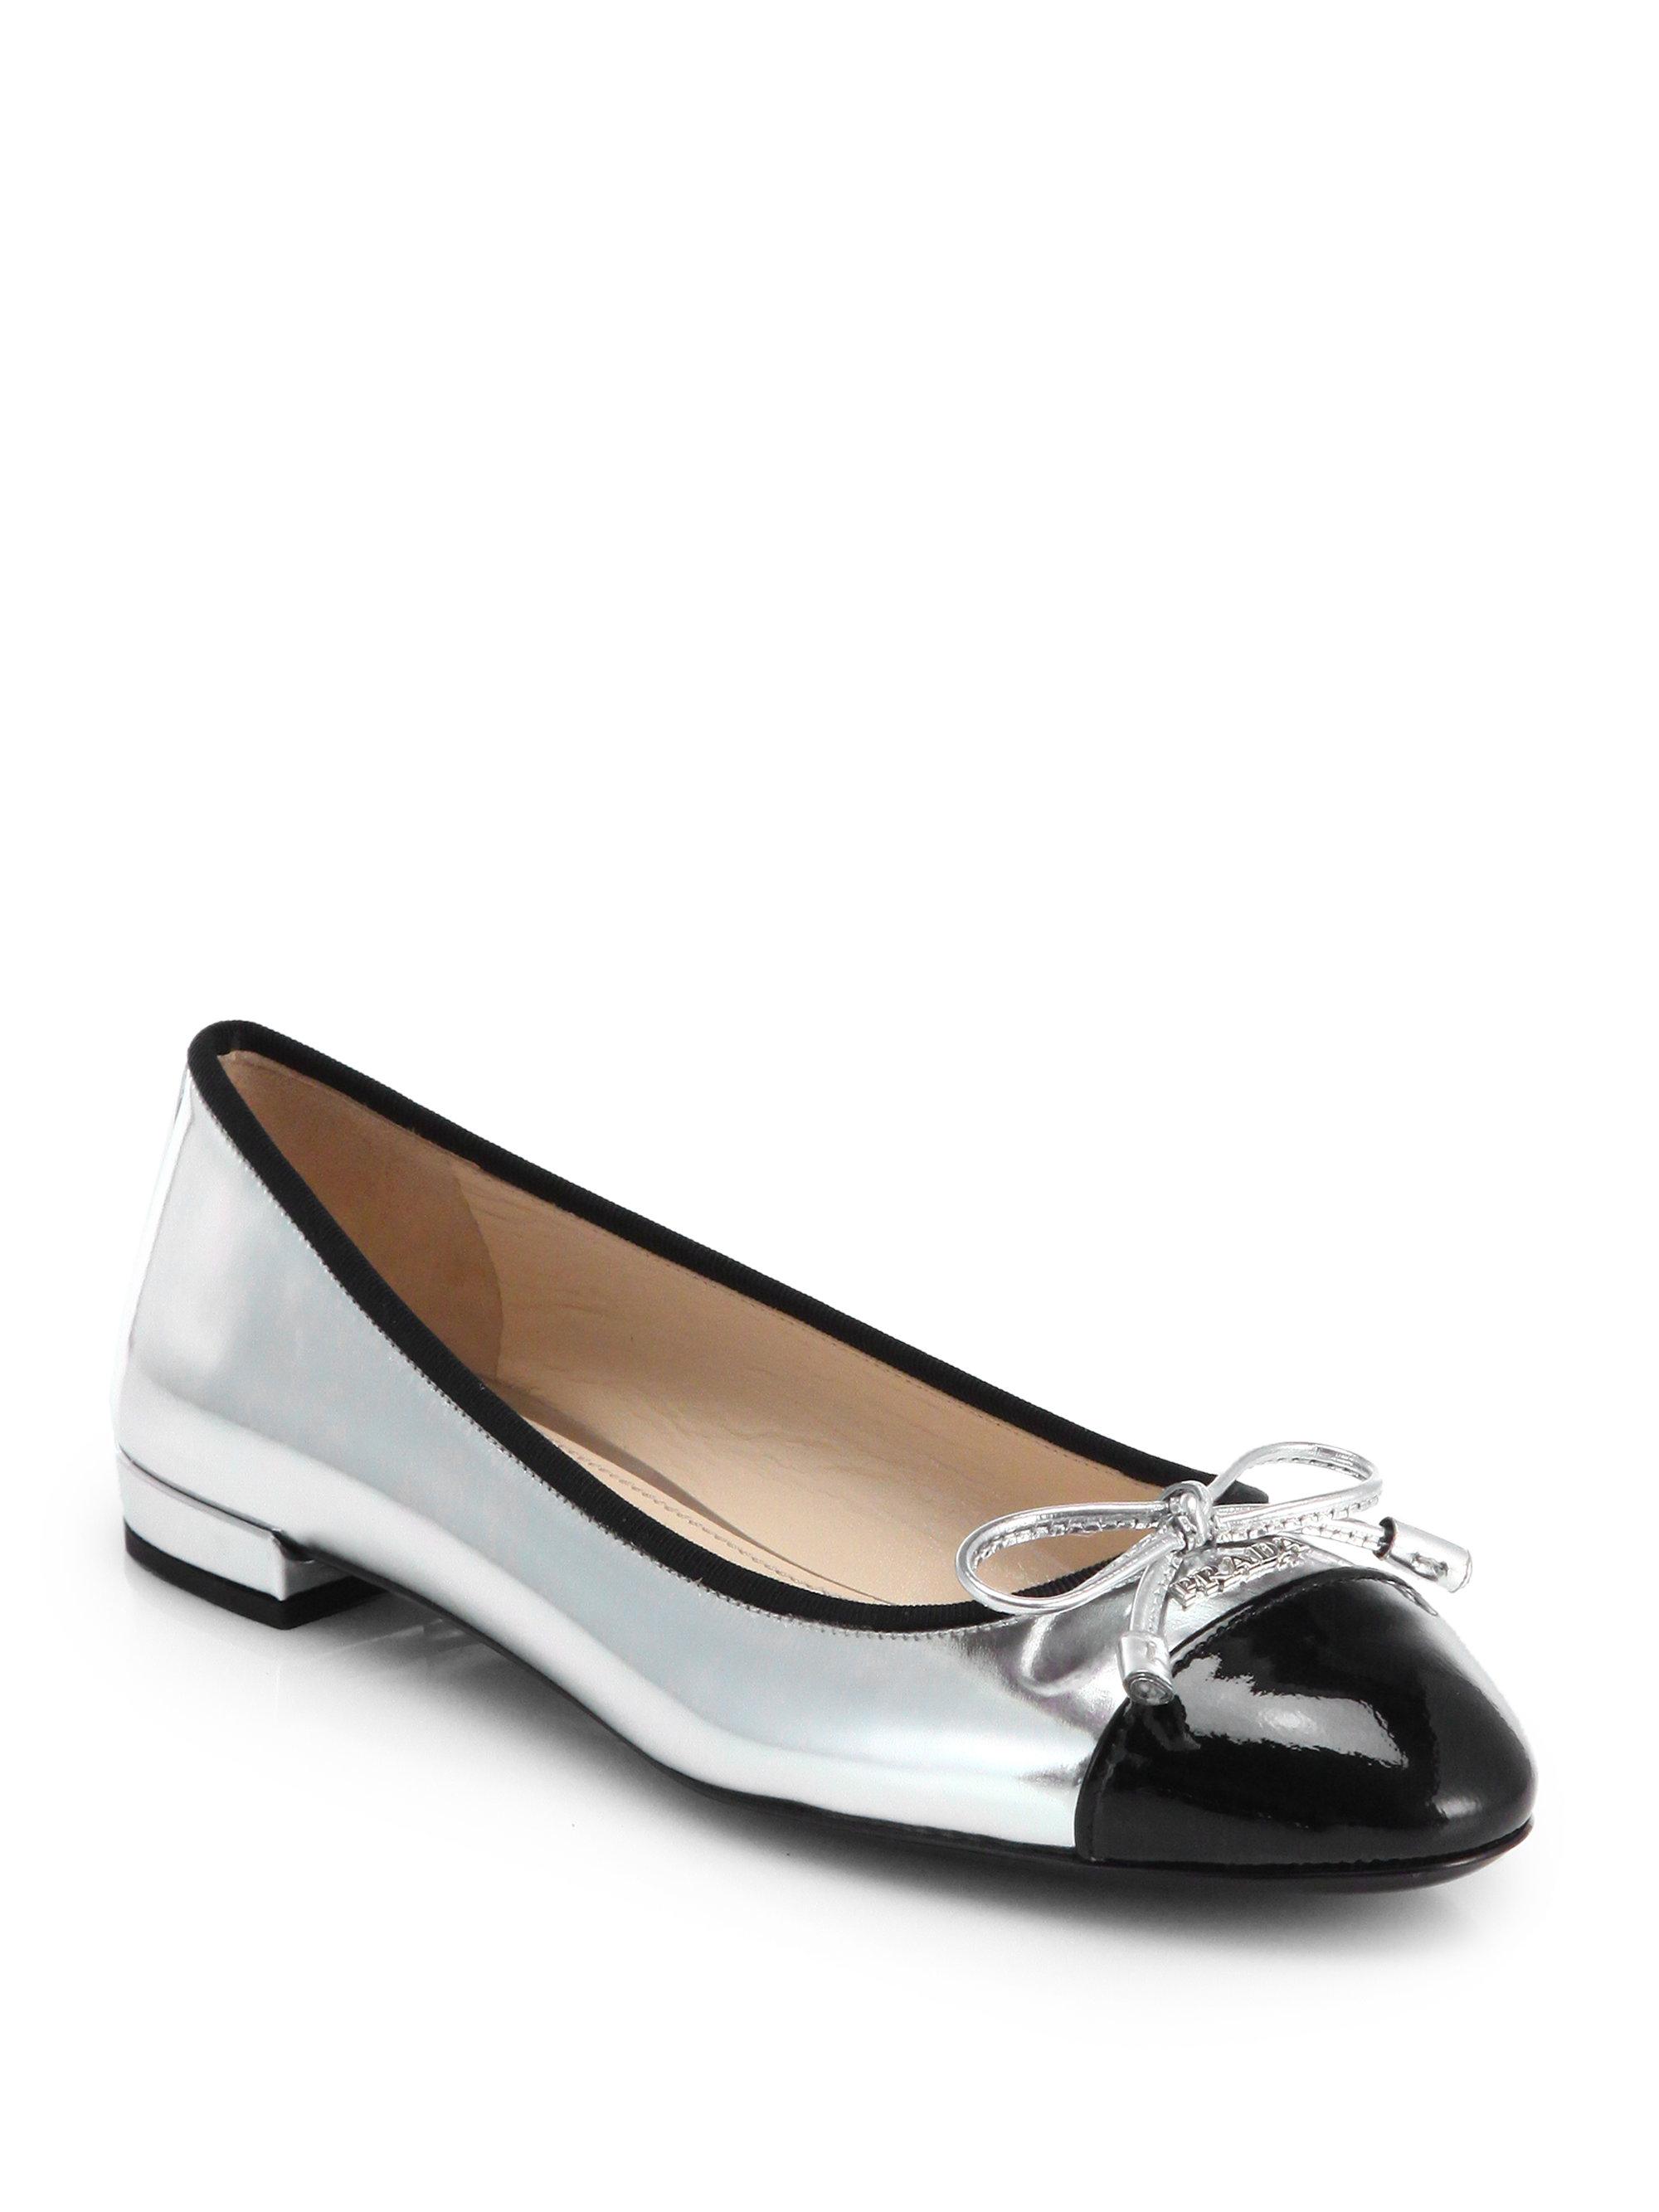 Prada Textured Ballerina Flats L6qNkO4SC